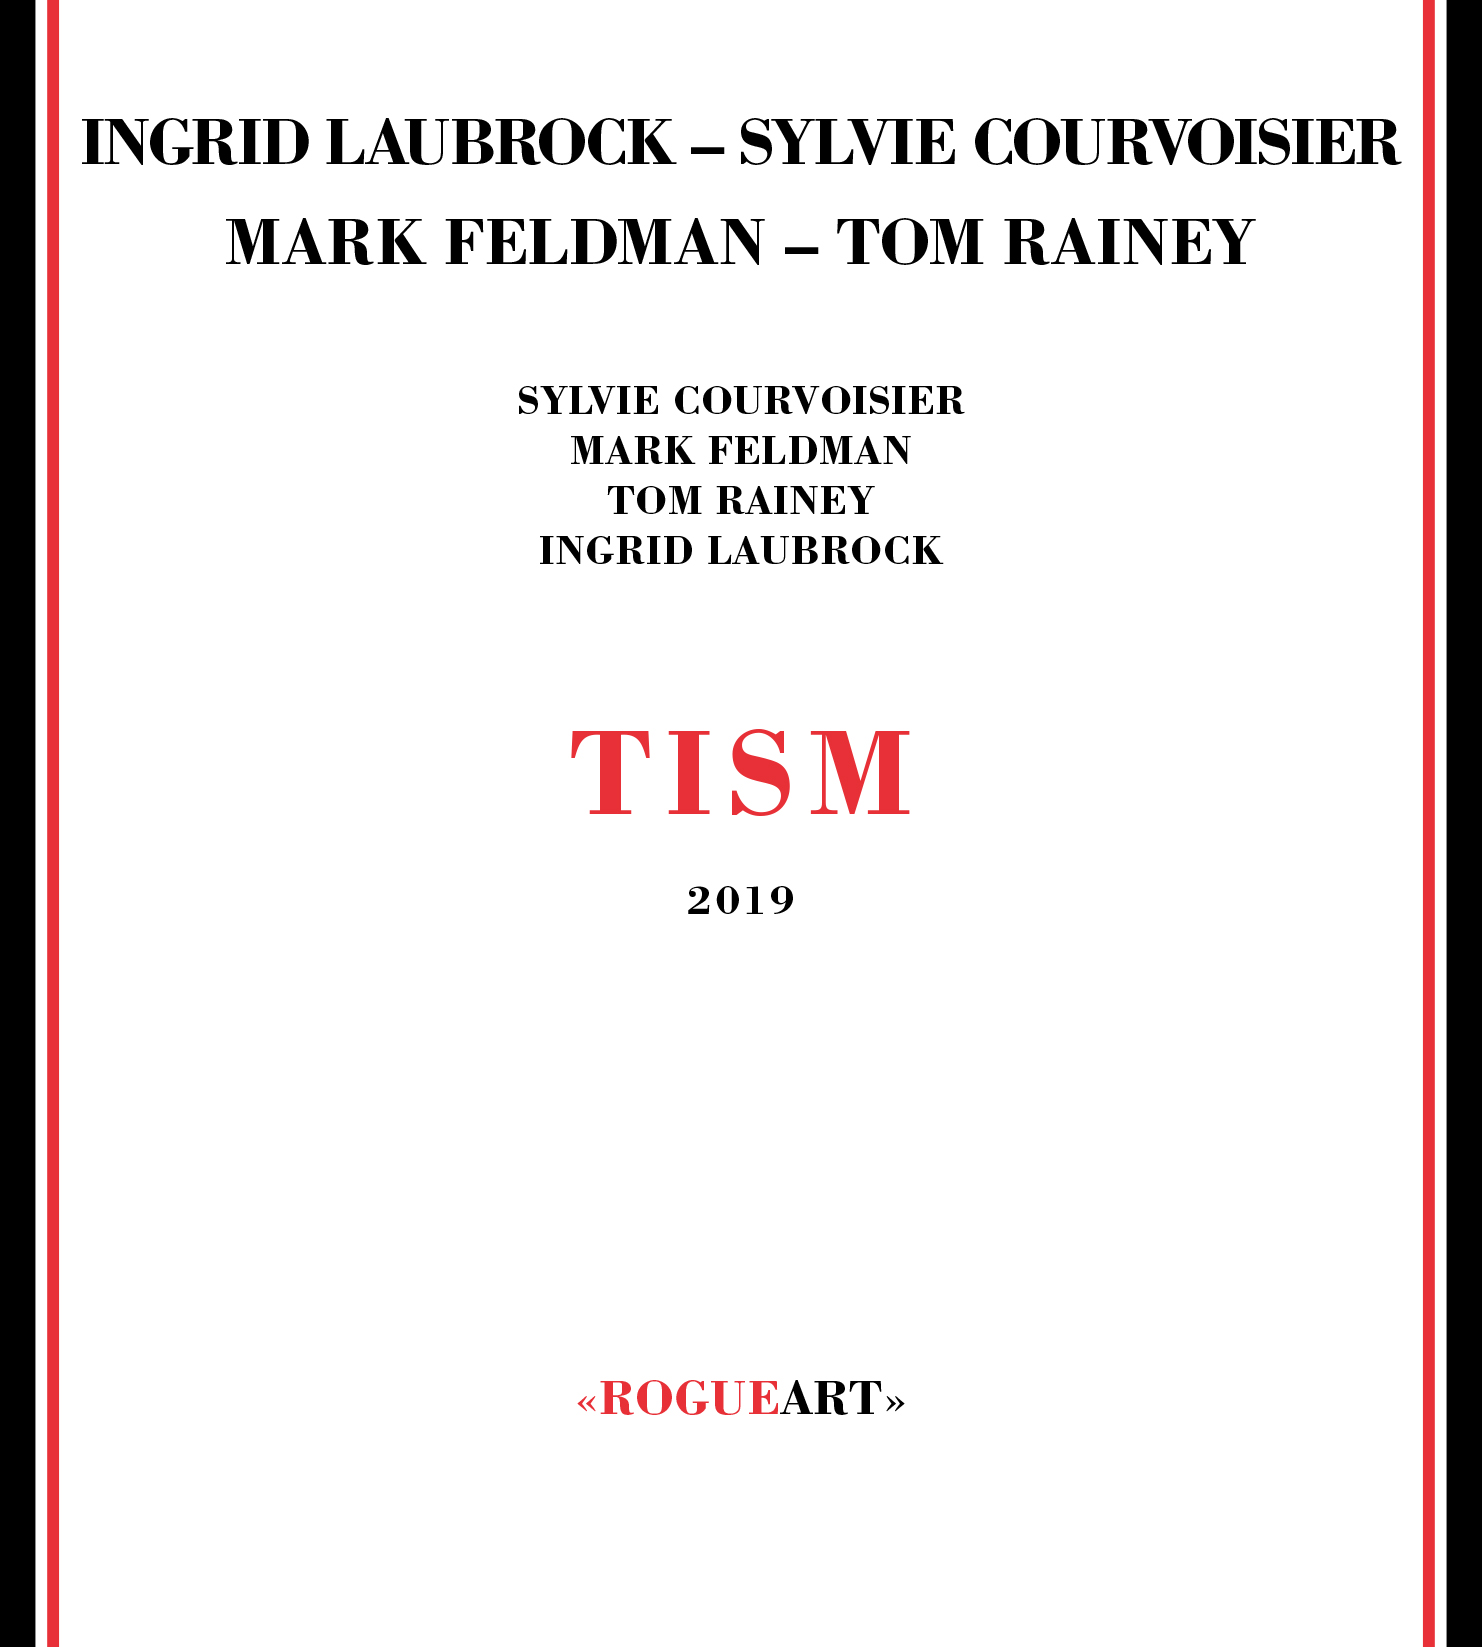 INGRID LAUBROCK - Tism cover